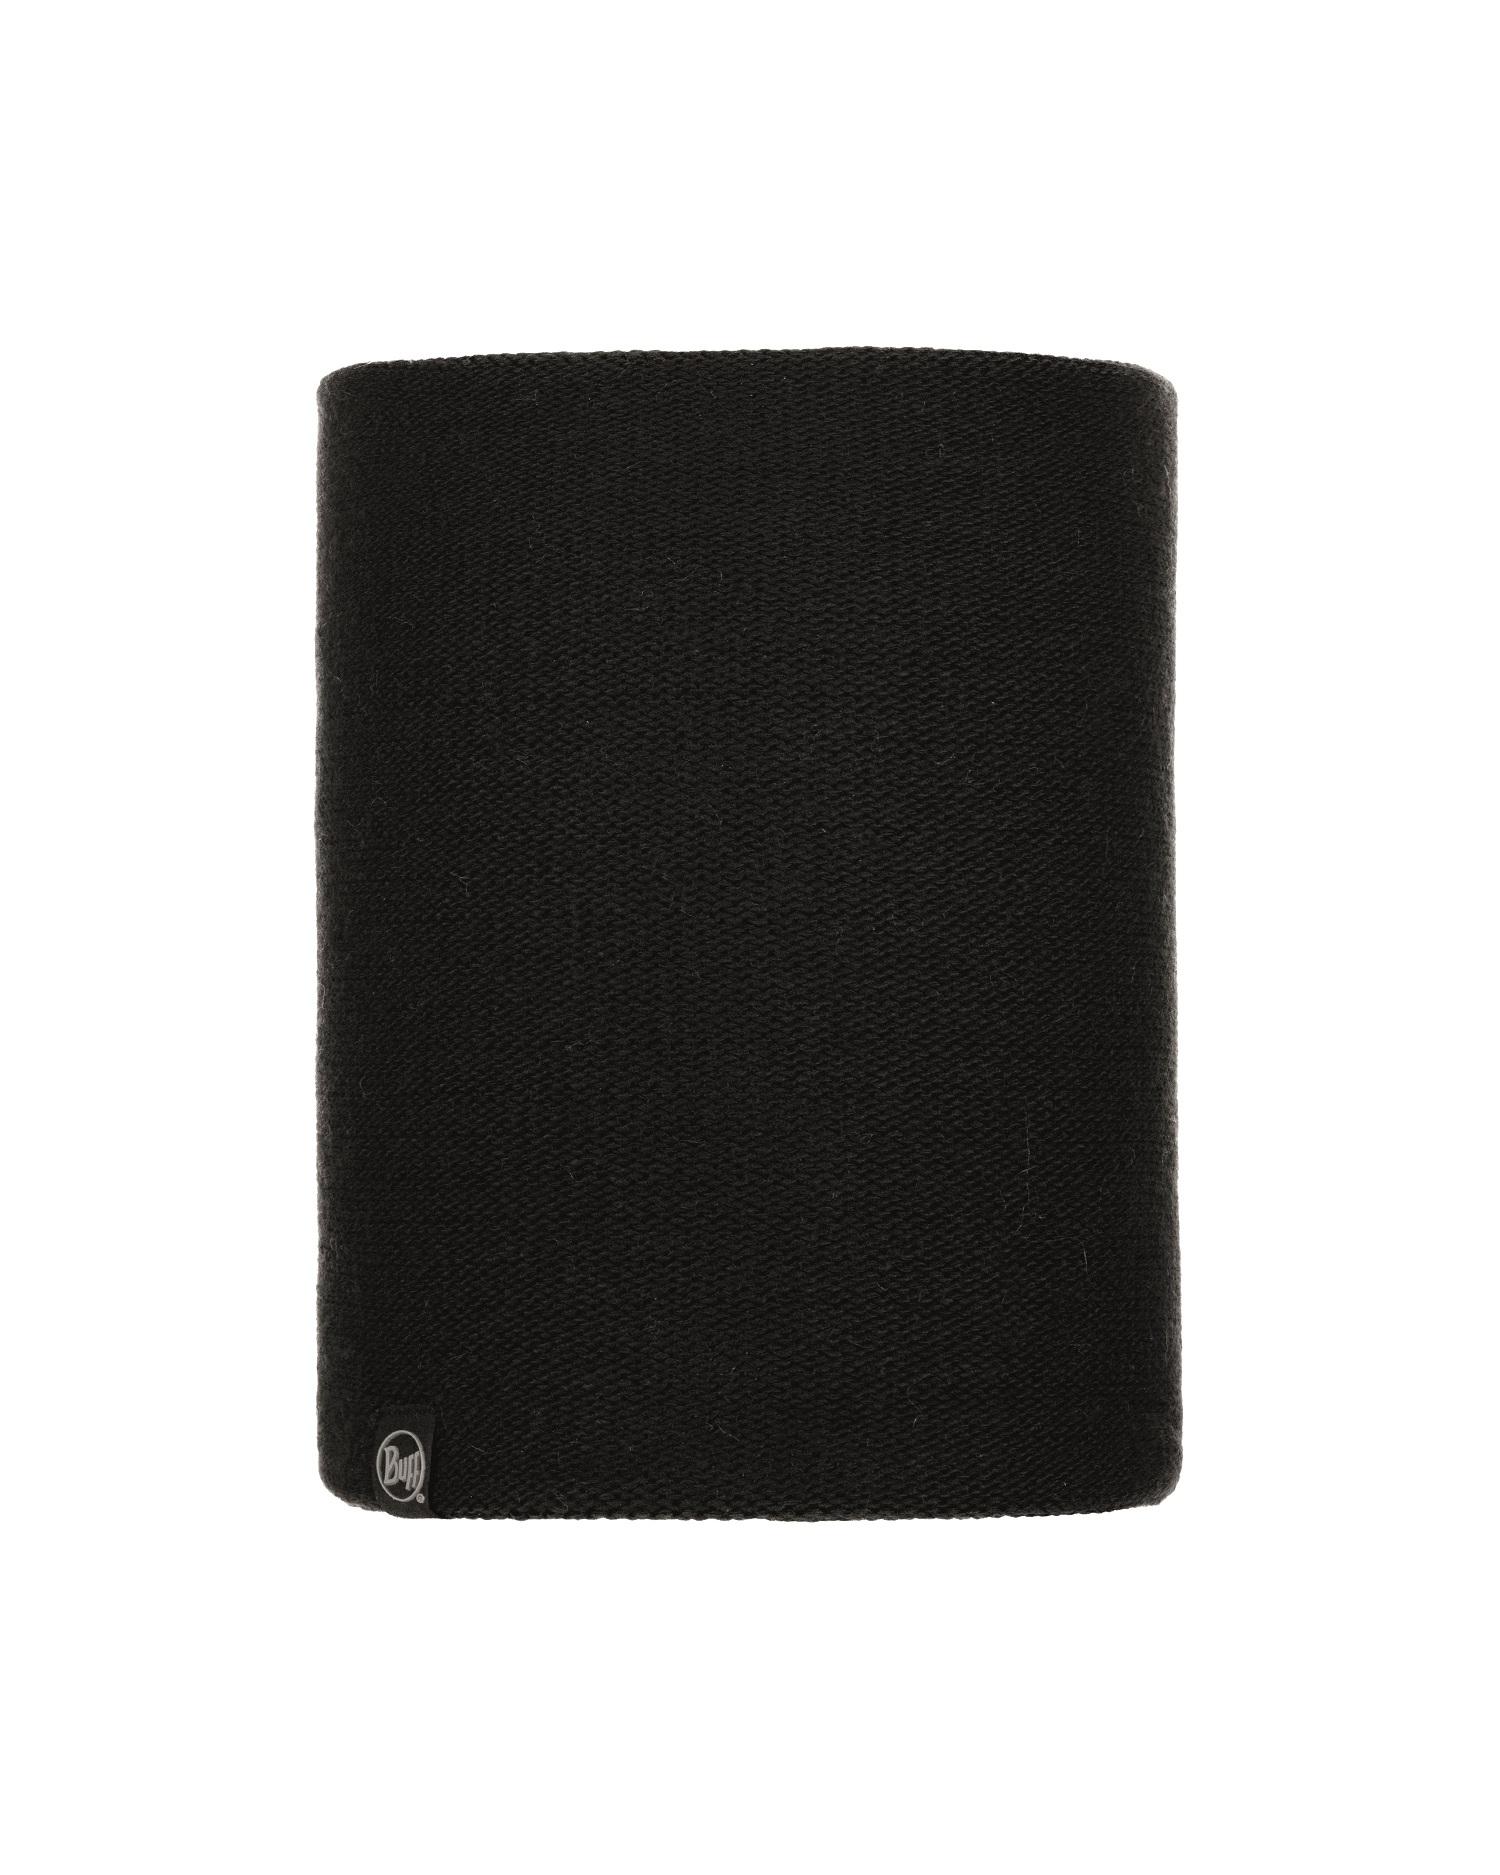 Шарф Buff Knitted Neckwarmer Colt Black